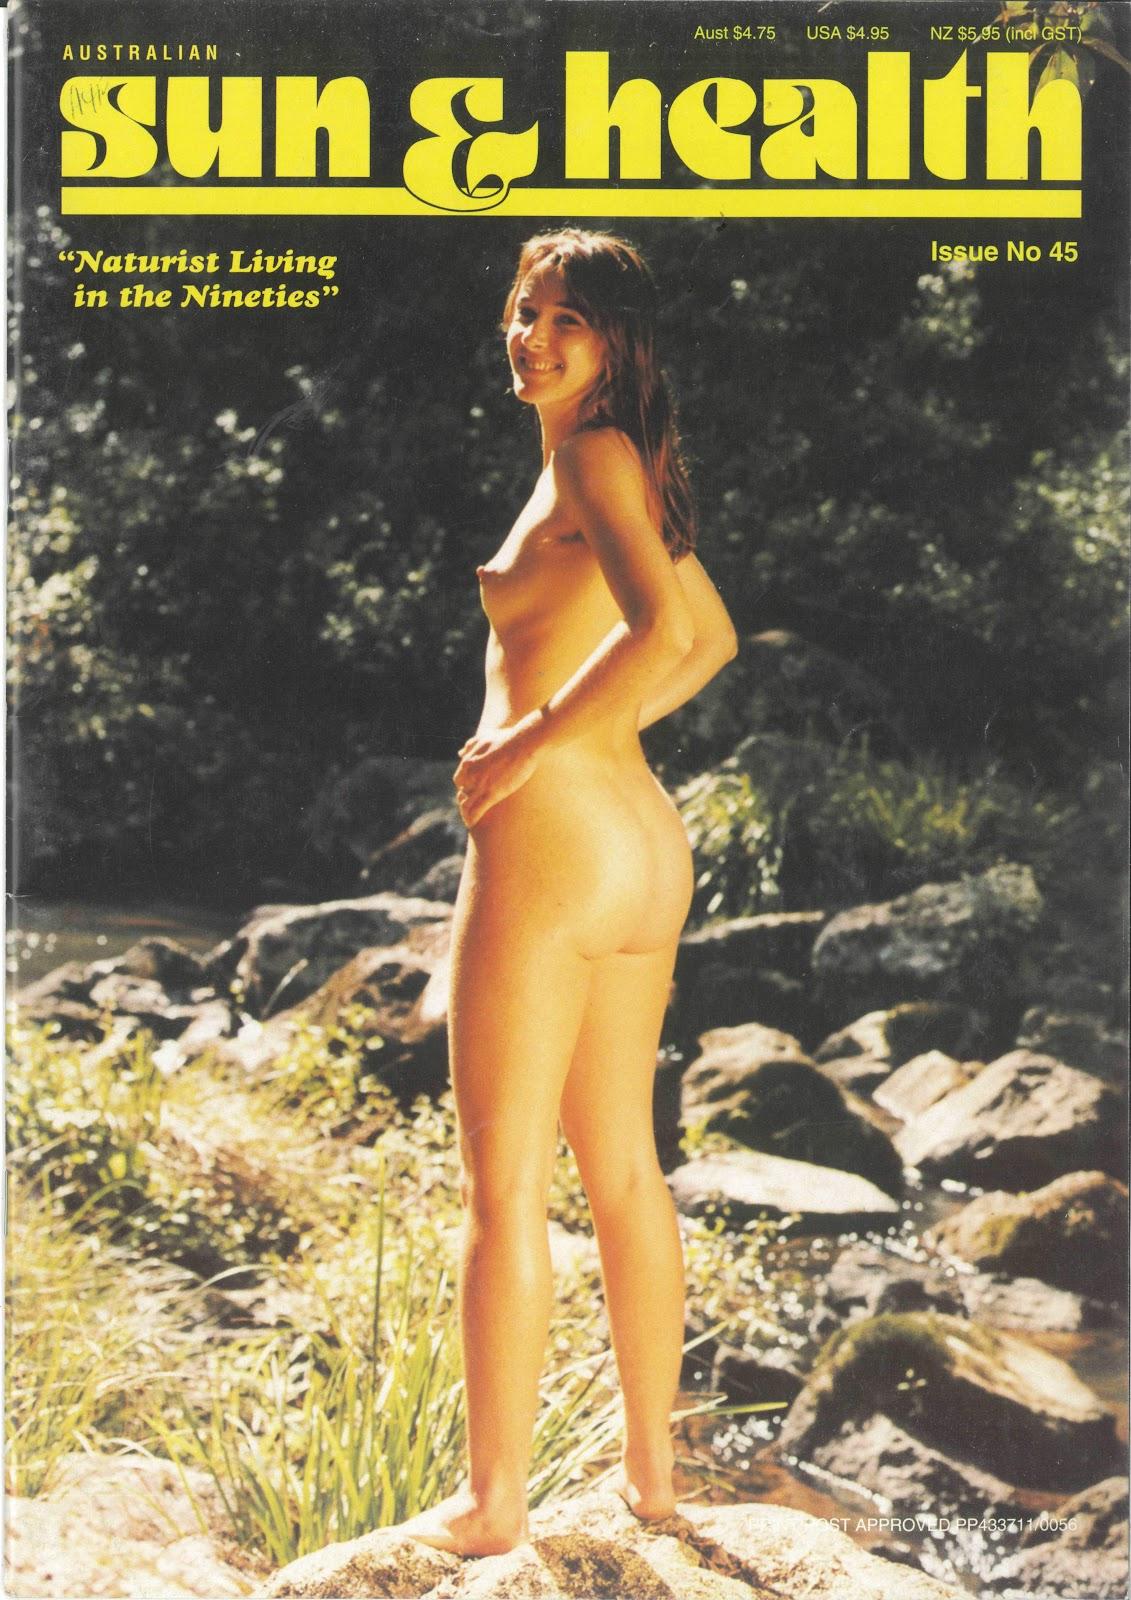 https://www.nudismlife.com/galleries/nudists_and_nude/the_most_natural_nudists/the_most_natural_nudists_0085.jpg